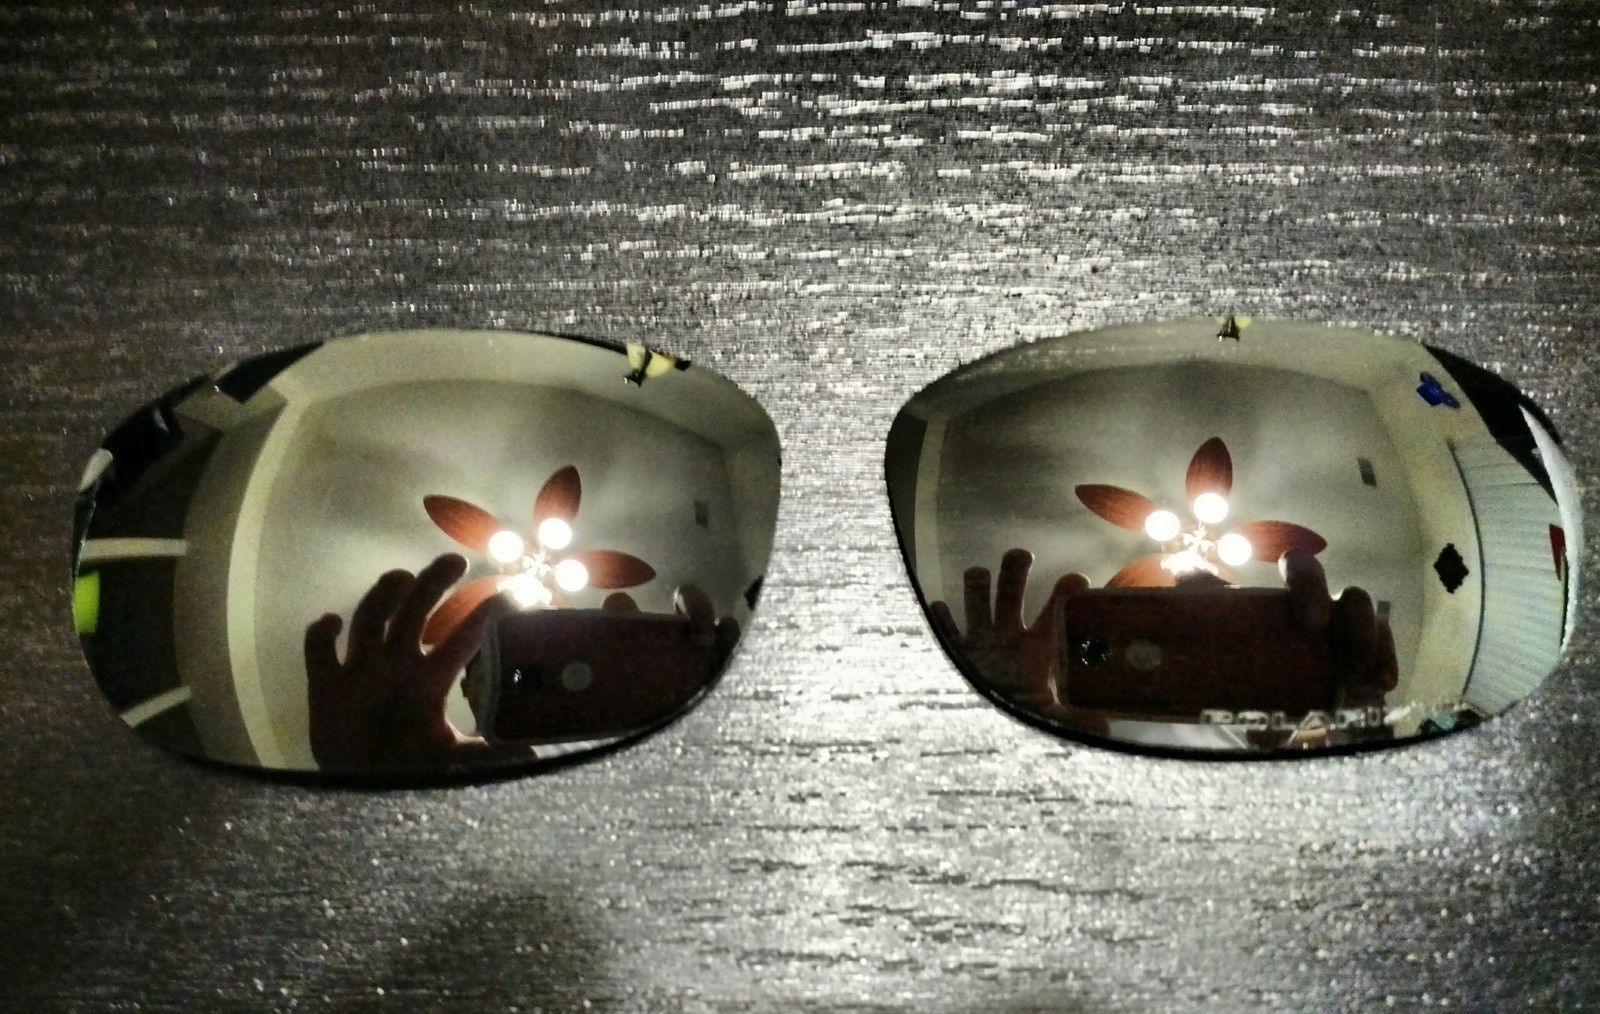 PB1 custom ruby lense and PB2 Black Polarized - uploadfromtaptalk1416879867808.jpg